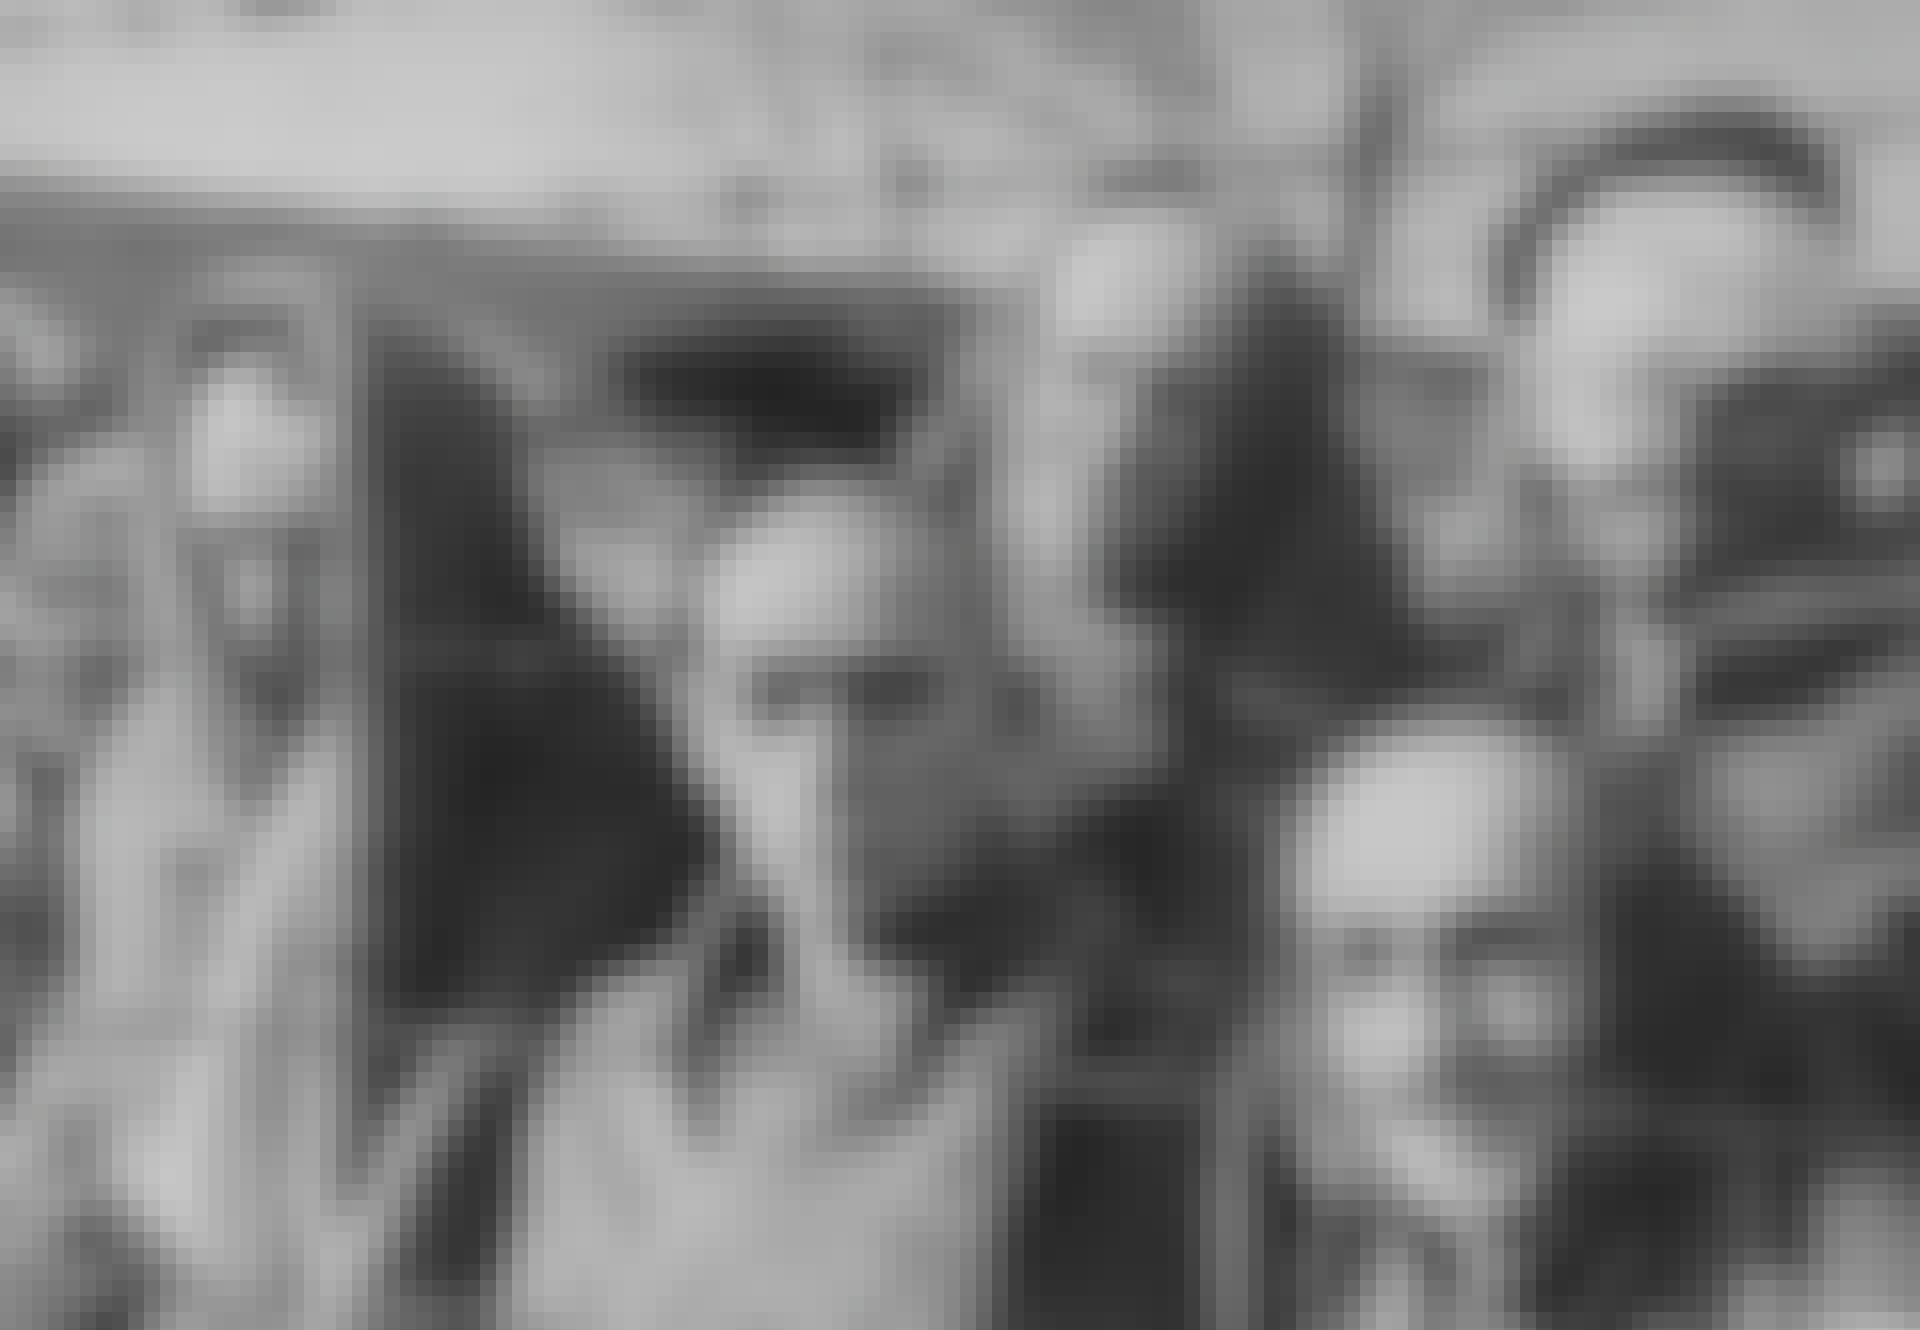 Auschwitz-gevangenfanger bag pigtråd